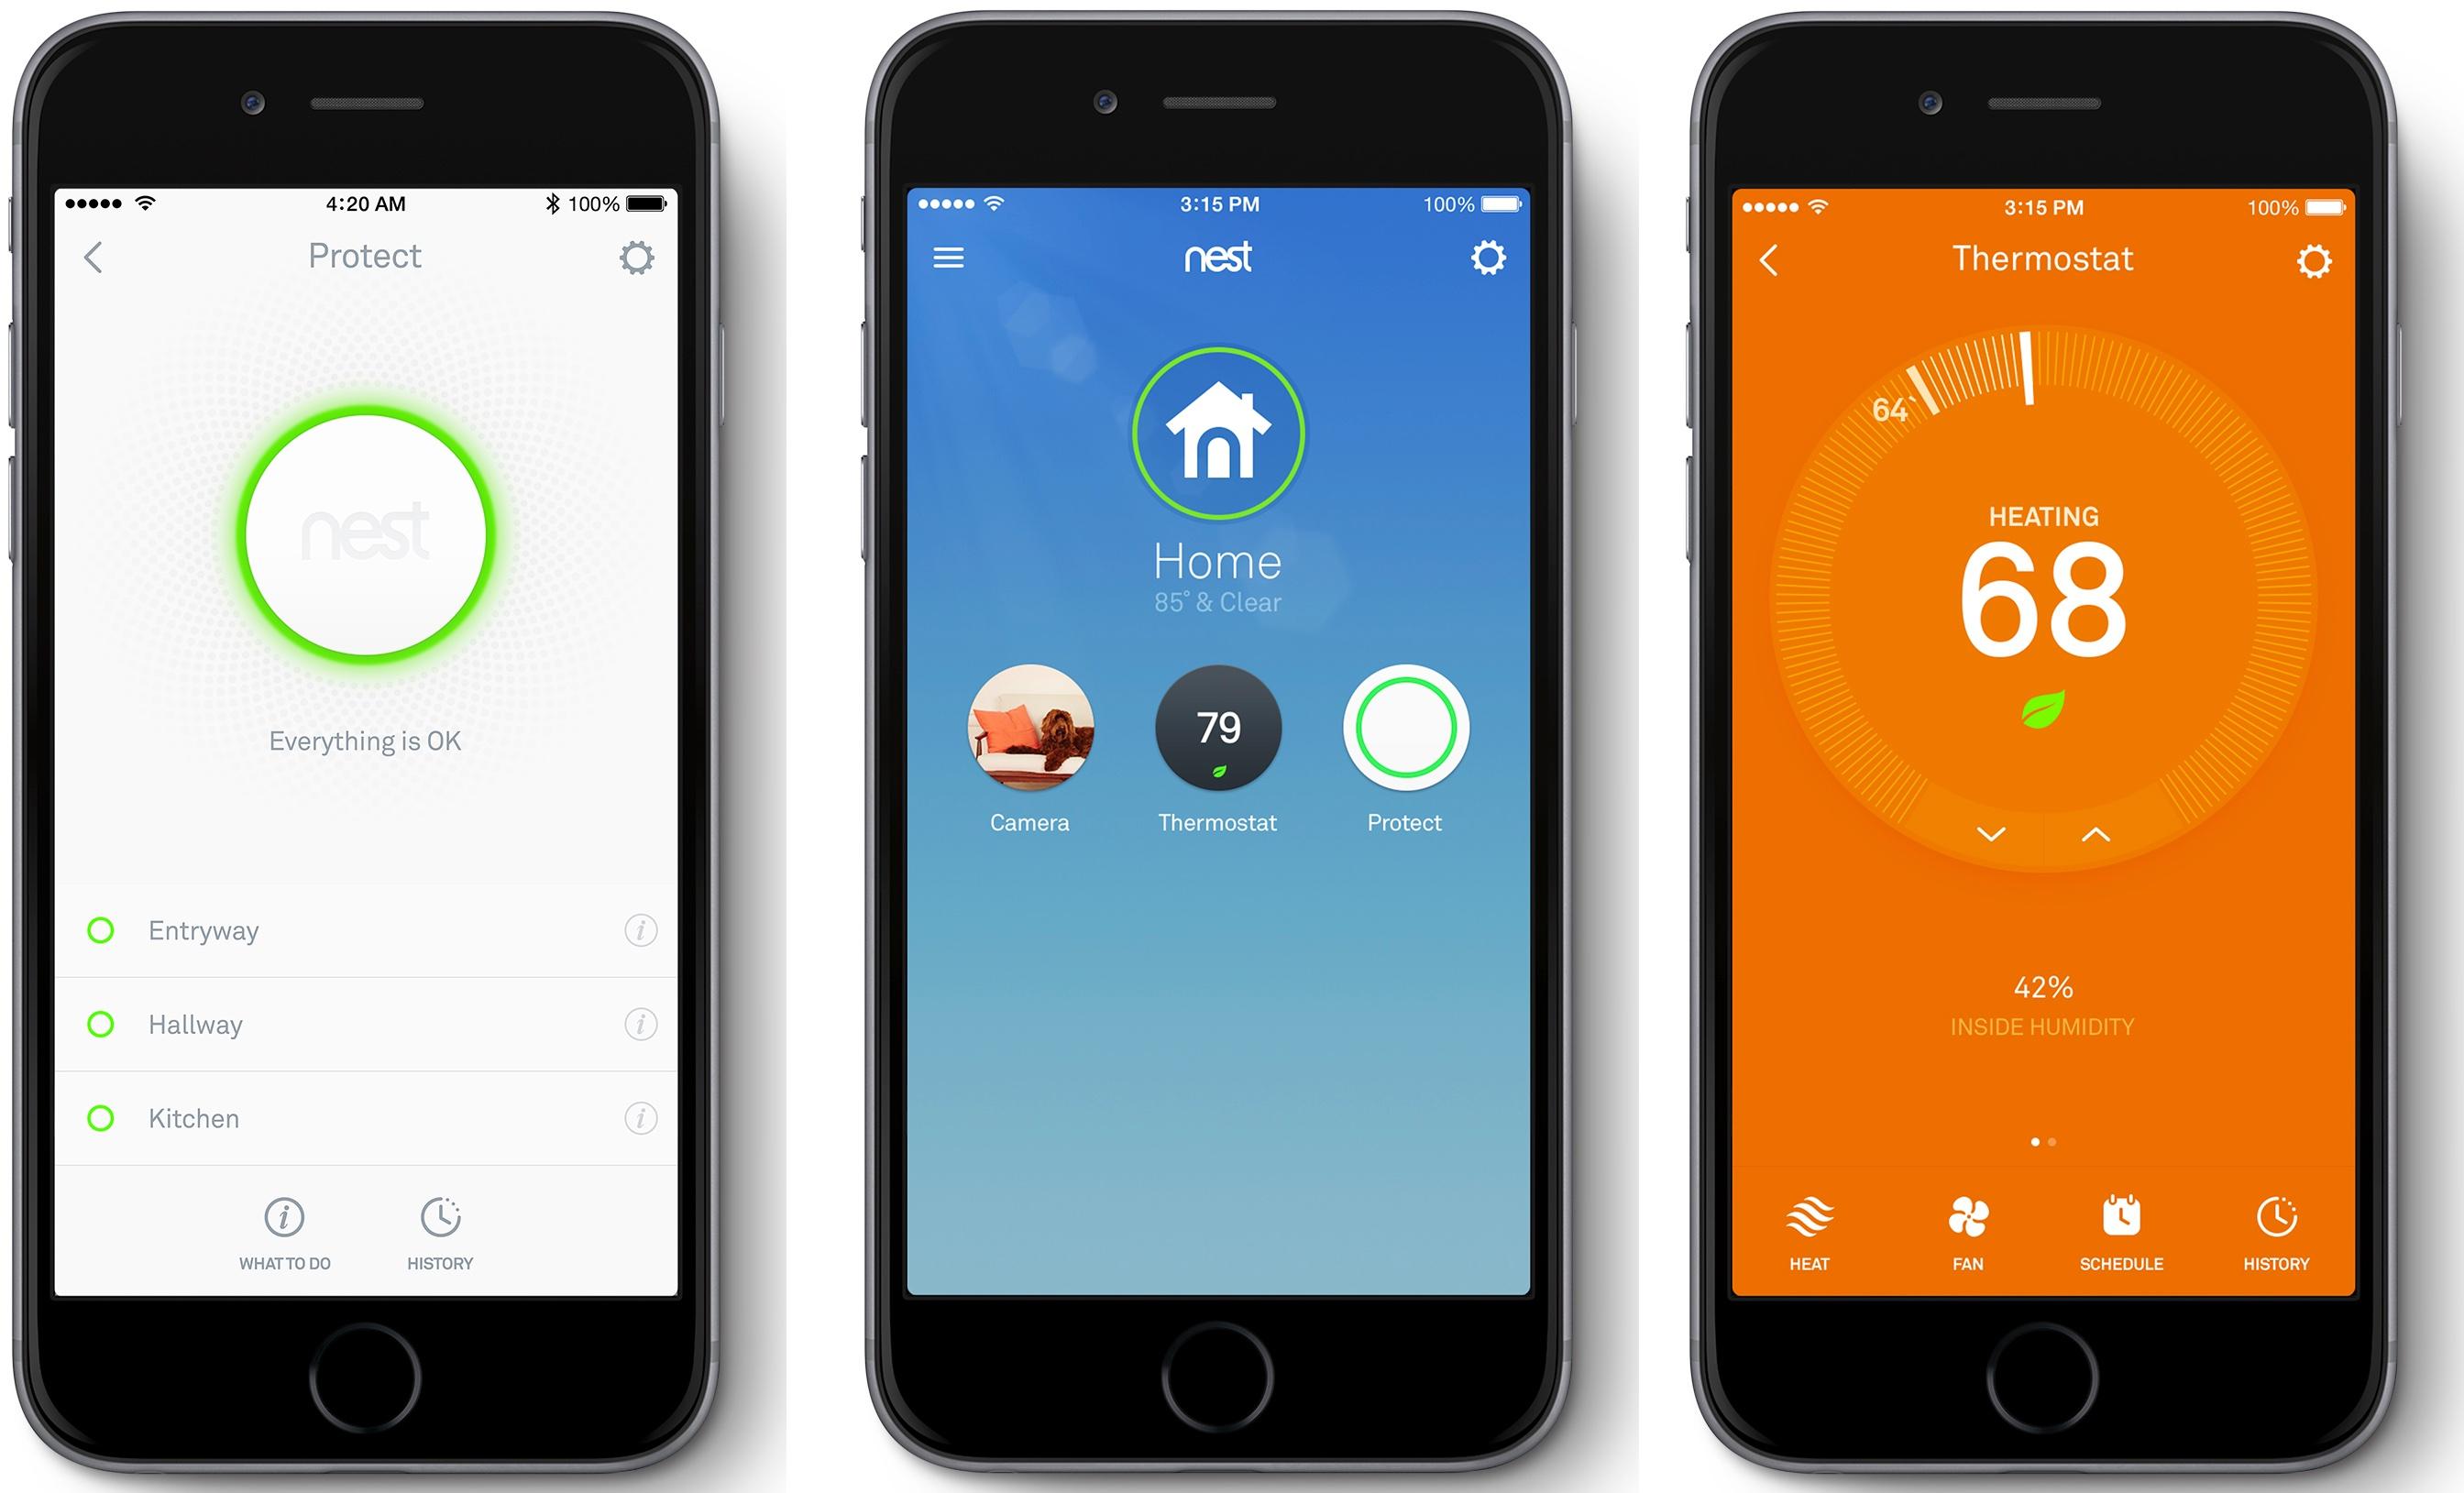 Nest-5.0-for-iOS-iPhone-screenshot-001